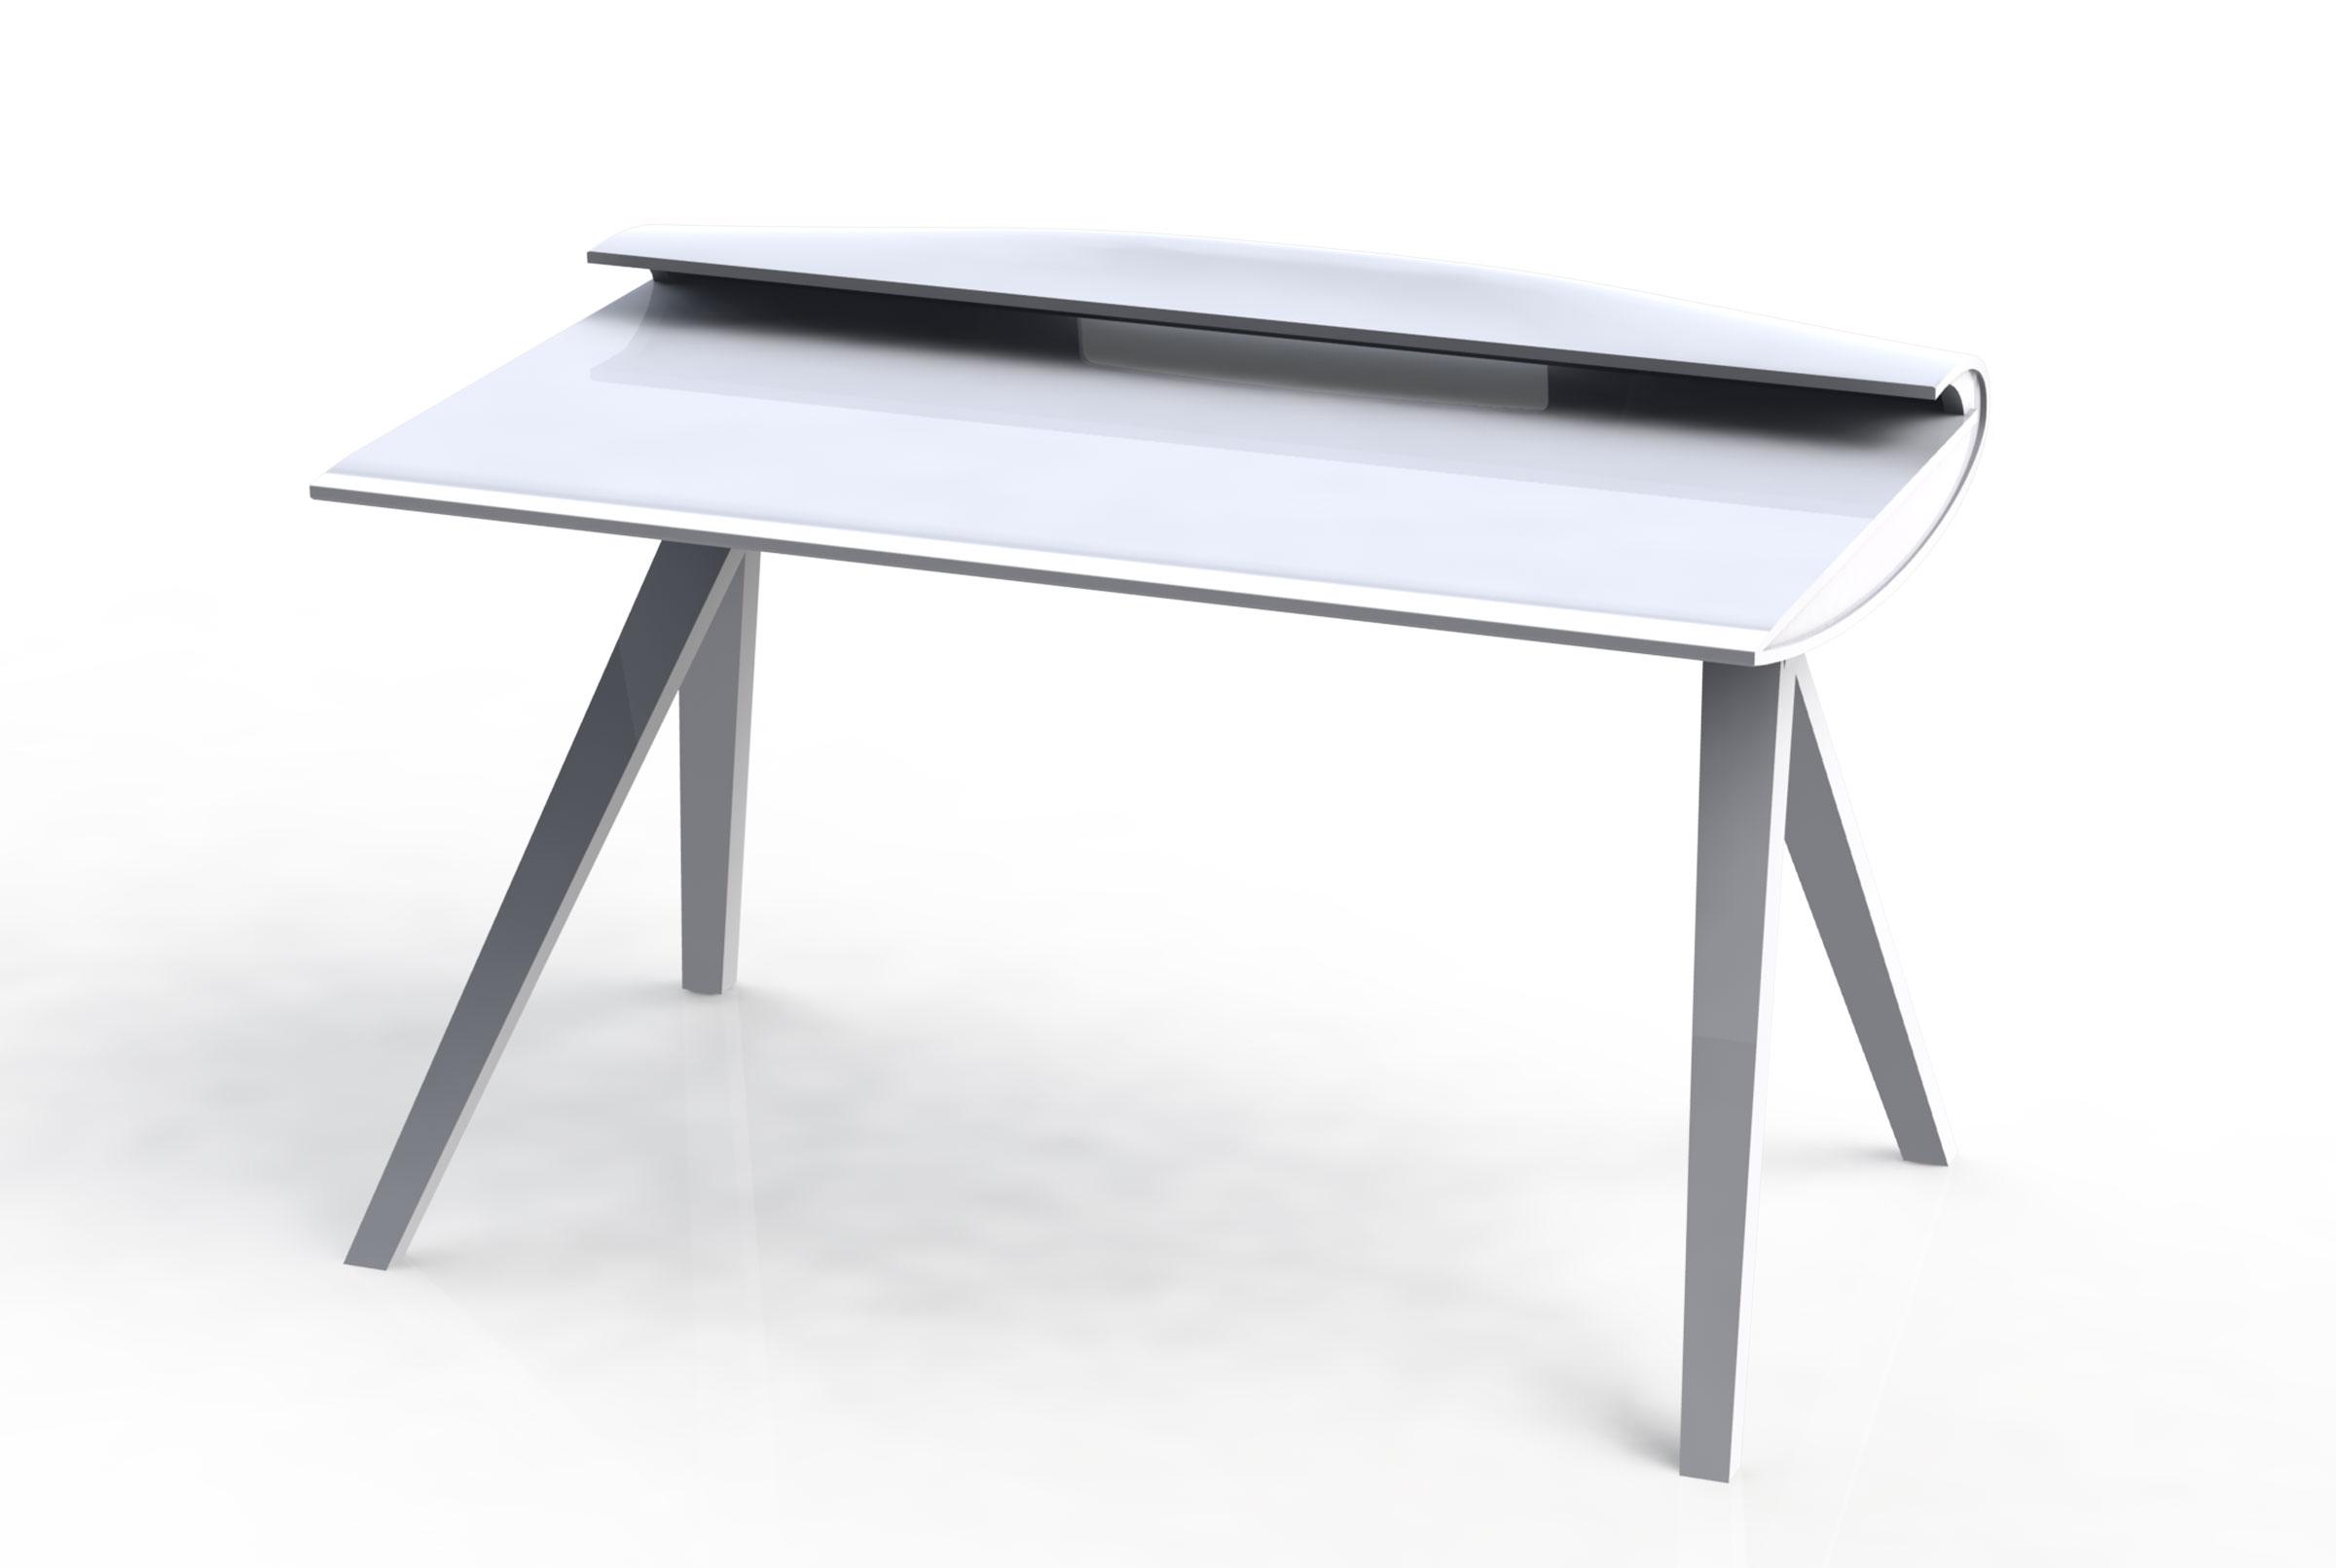 table6-3@2x.jpg